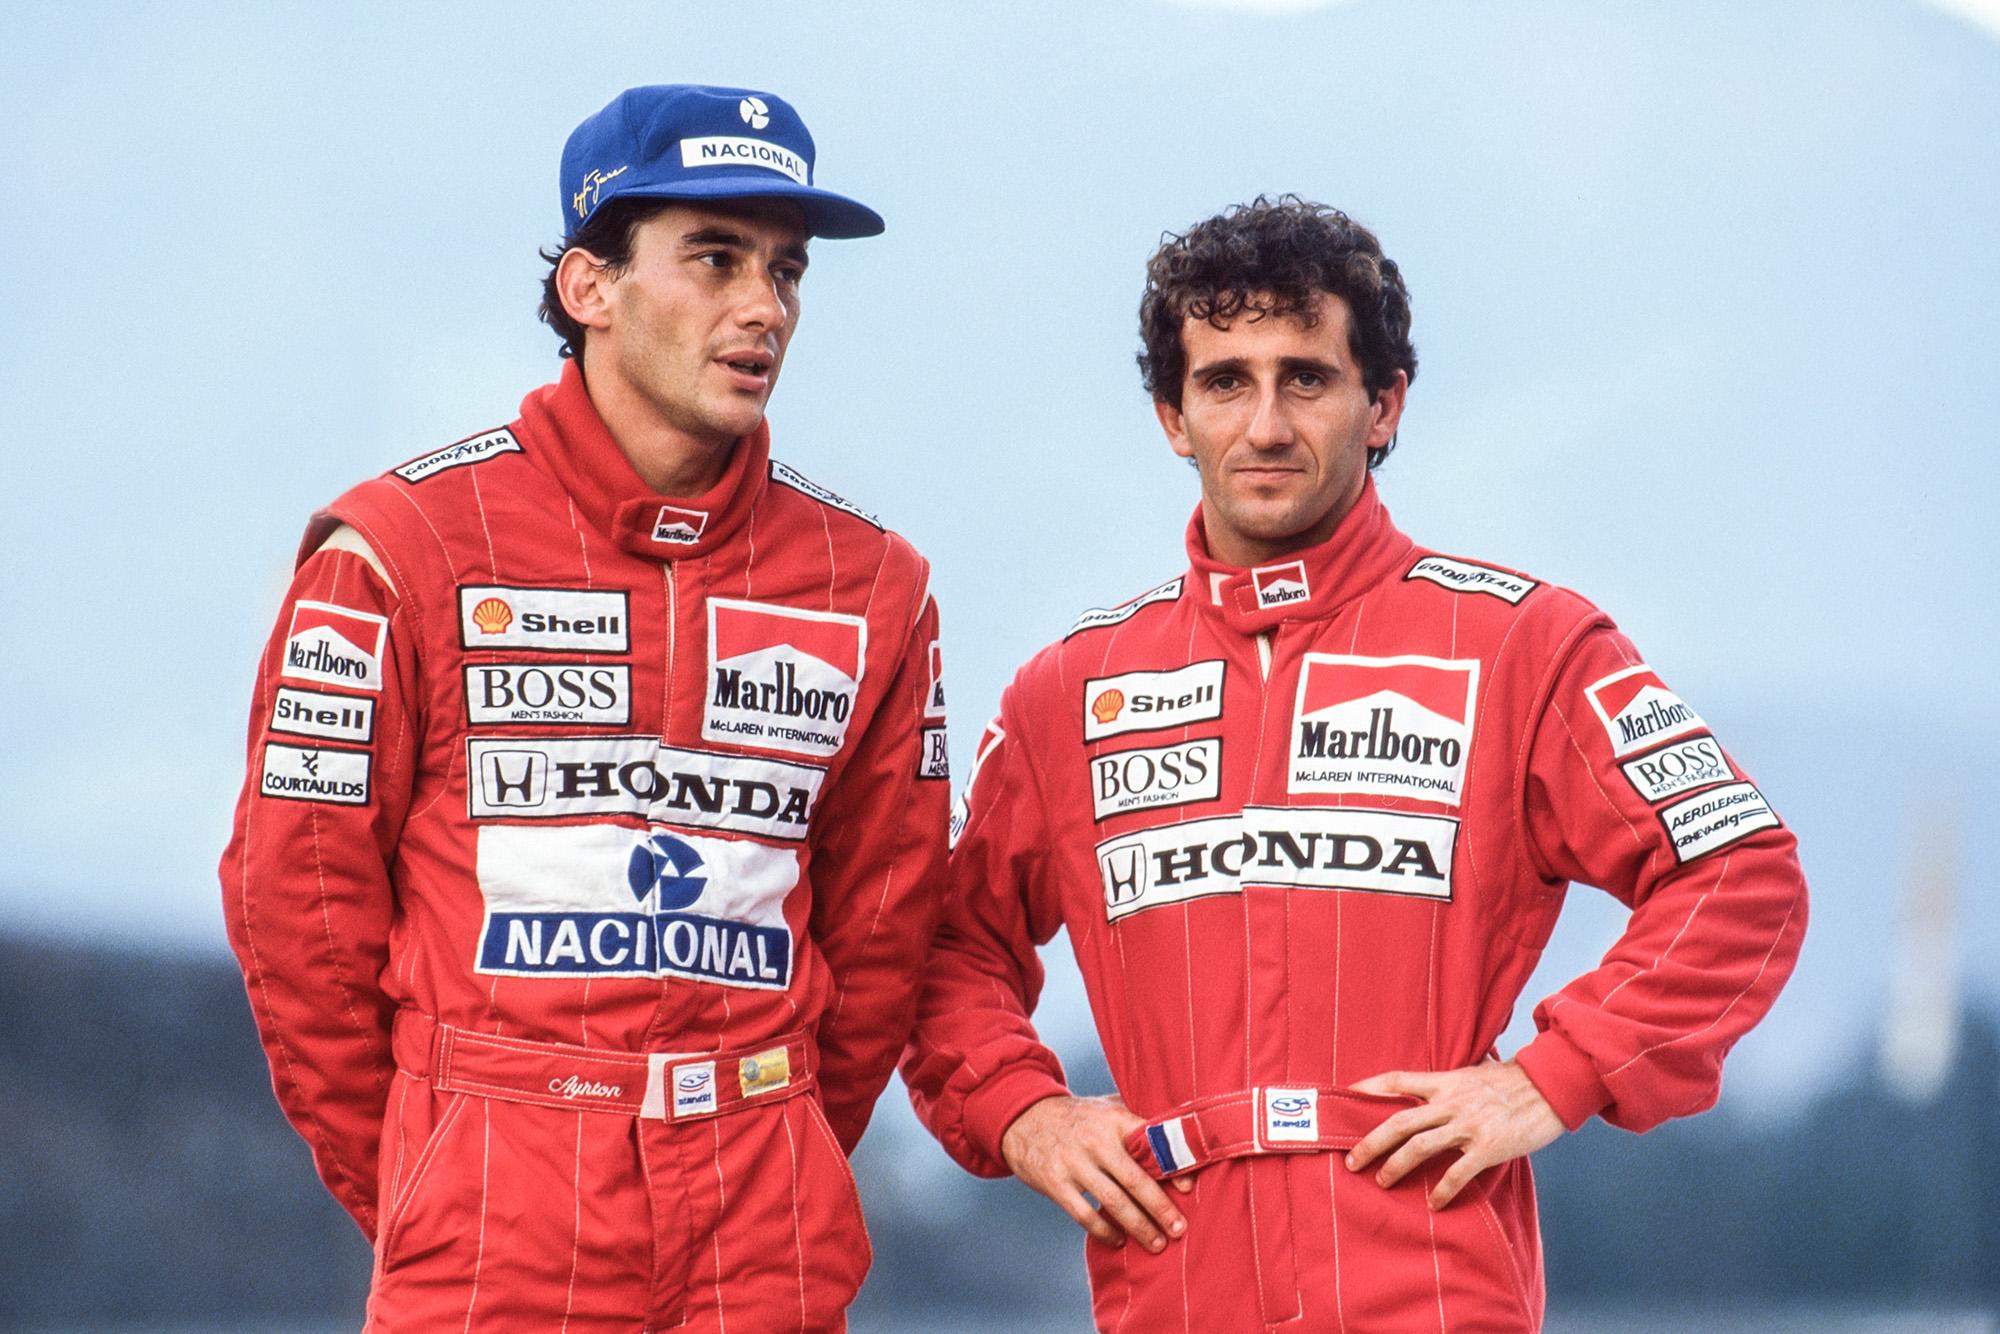 Ayrton Senna stands next to Alain Prost at the 1989 McLaren team photoshoot GPP